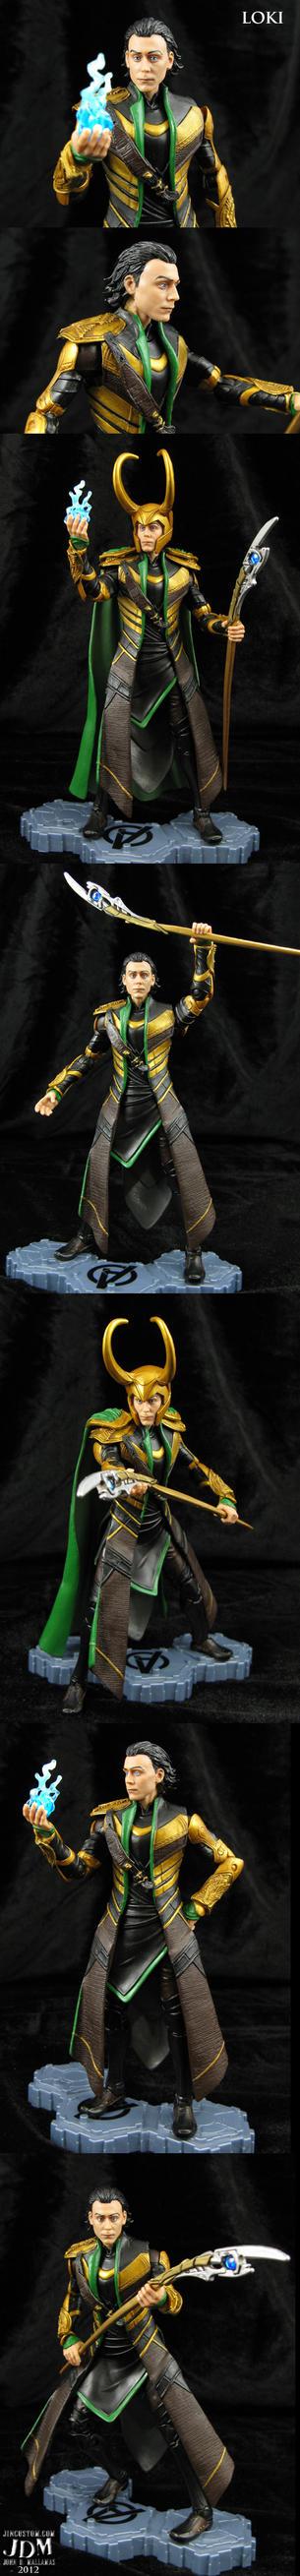 Custom Avengers Movie Loki with wispy hair tips by Jin-Saotome